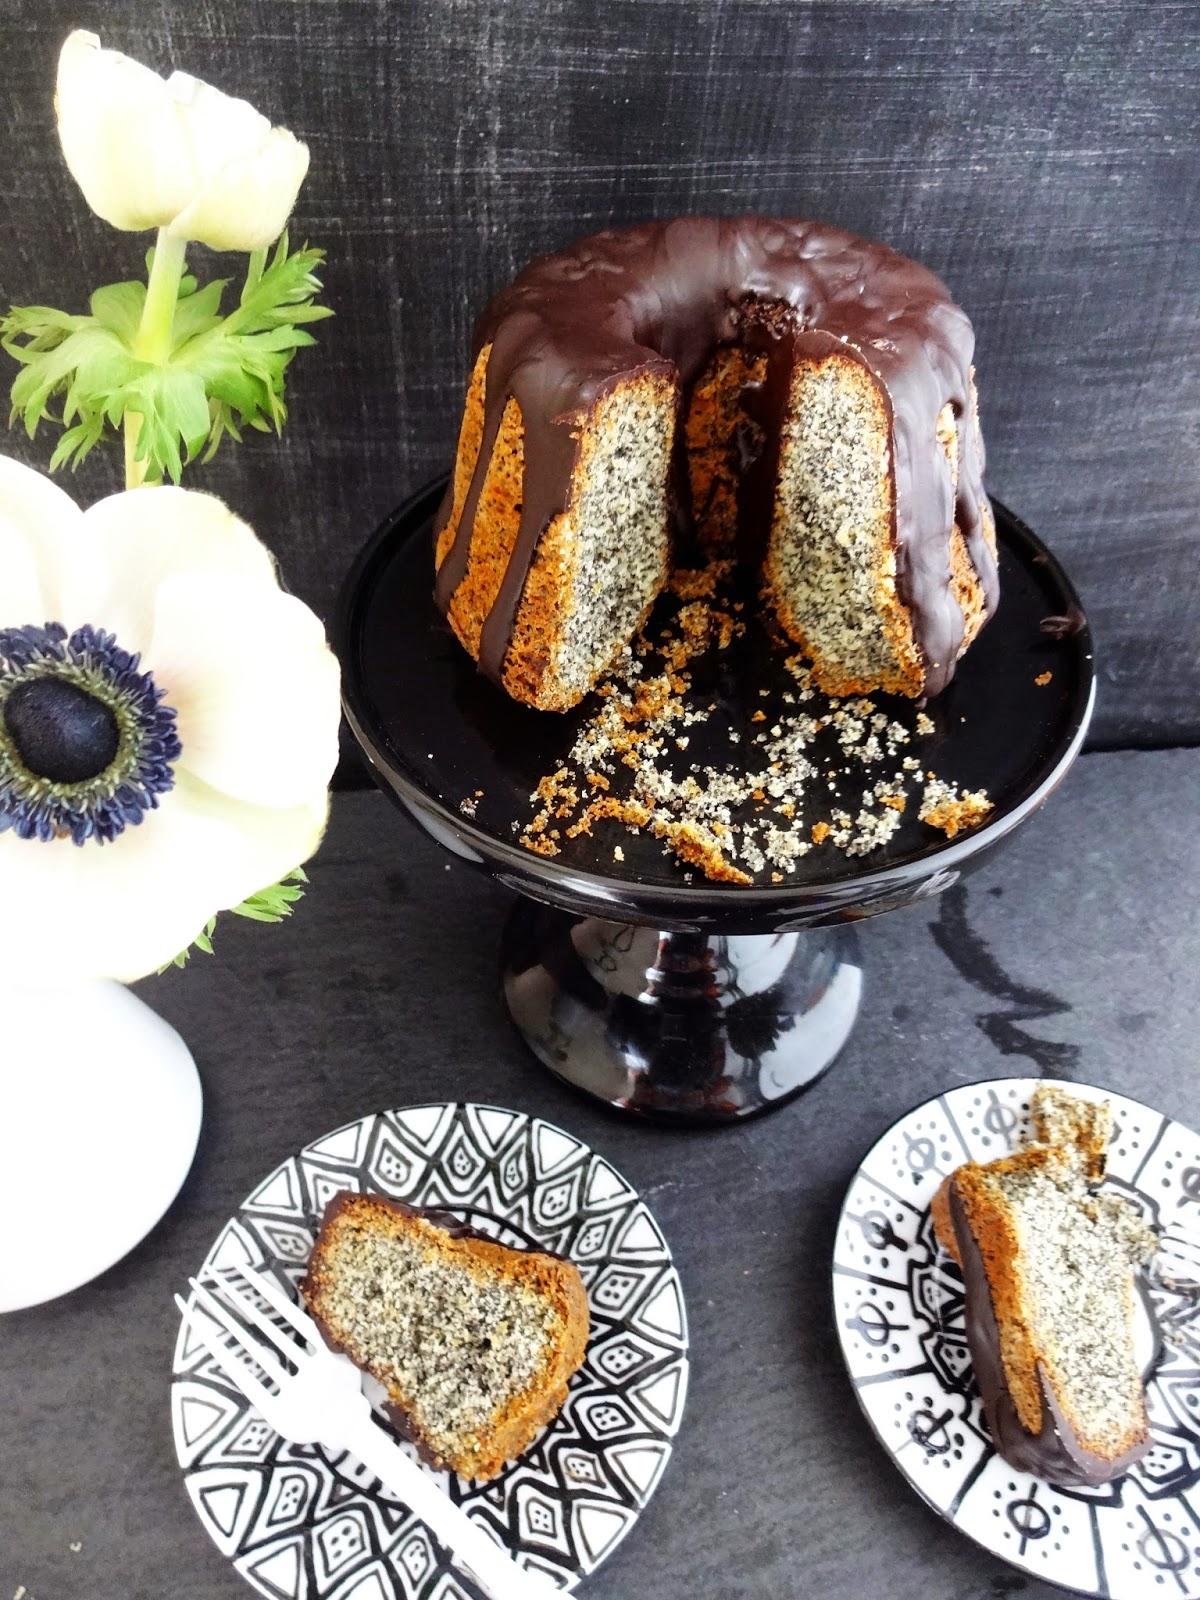 Basteln Malen Kuchen Backen Mohngugelhupf Bundt Cake Kouglof